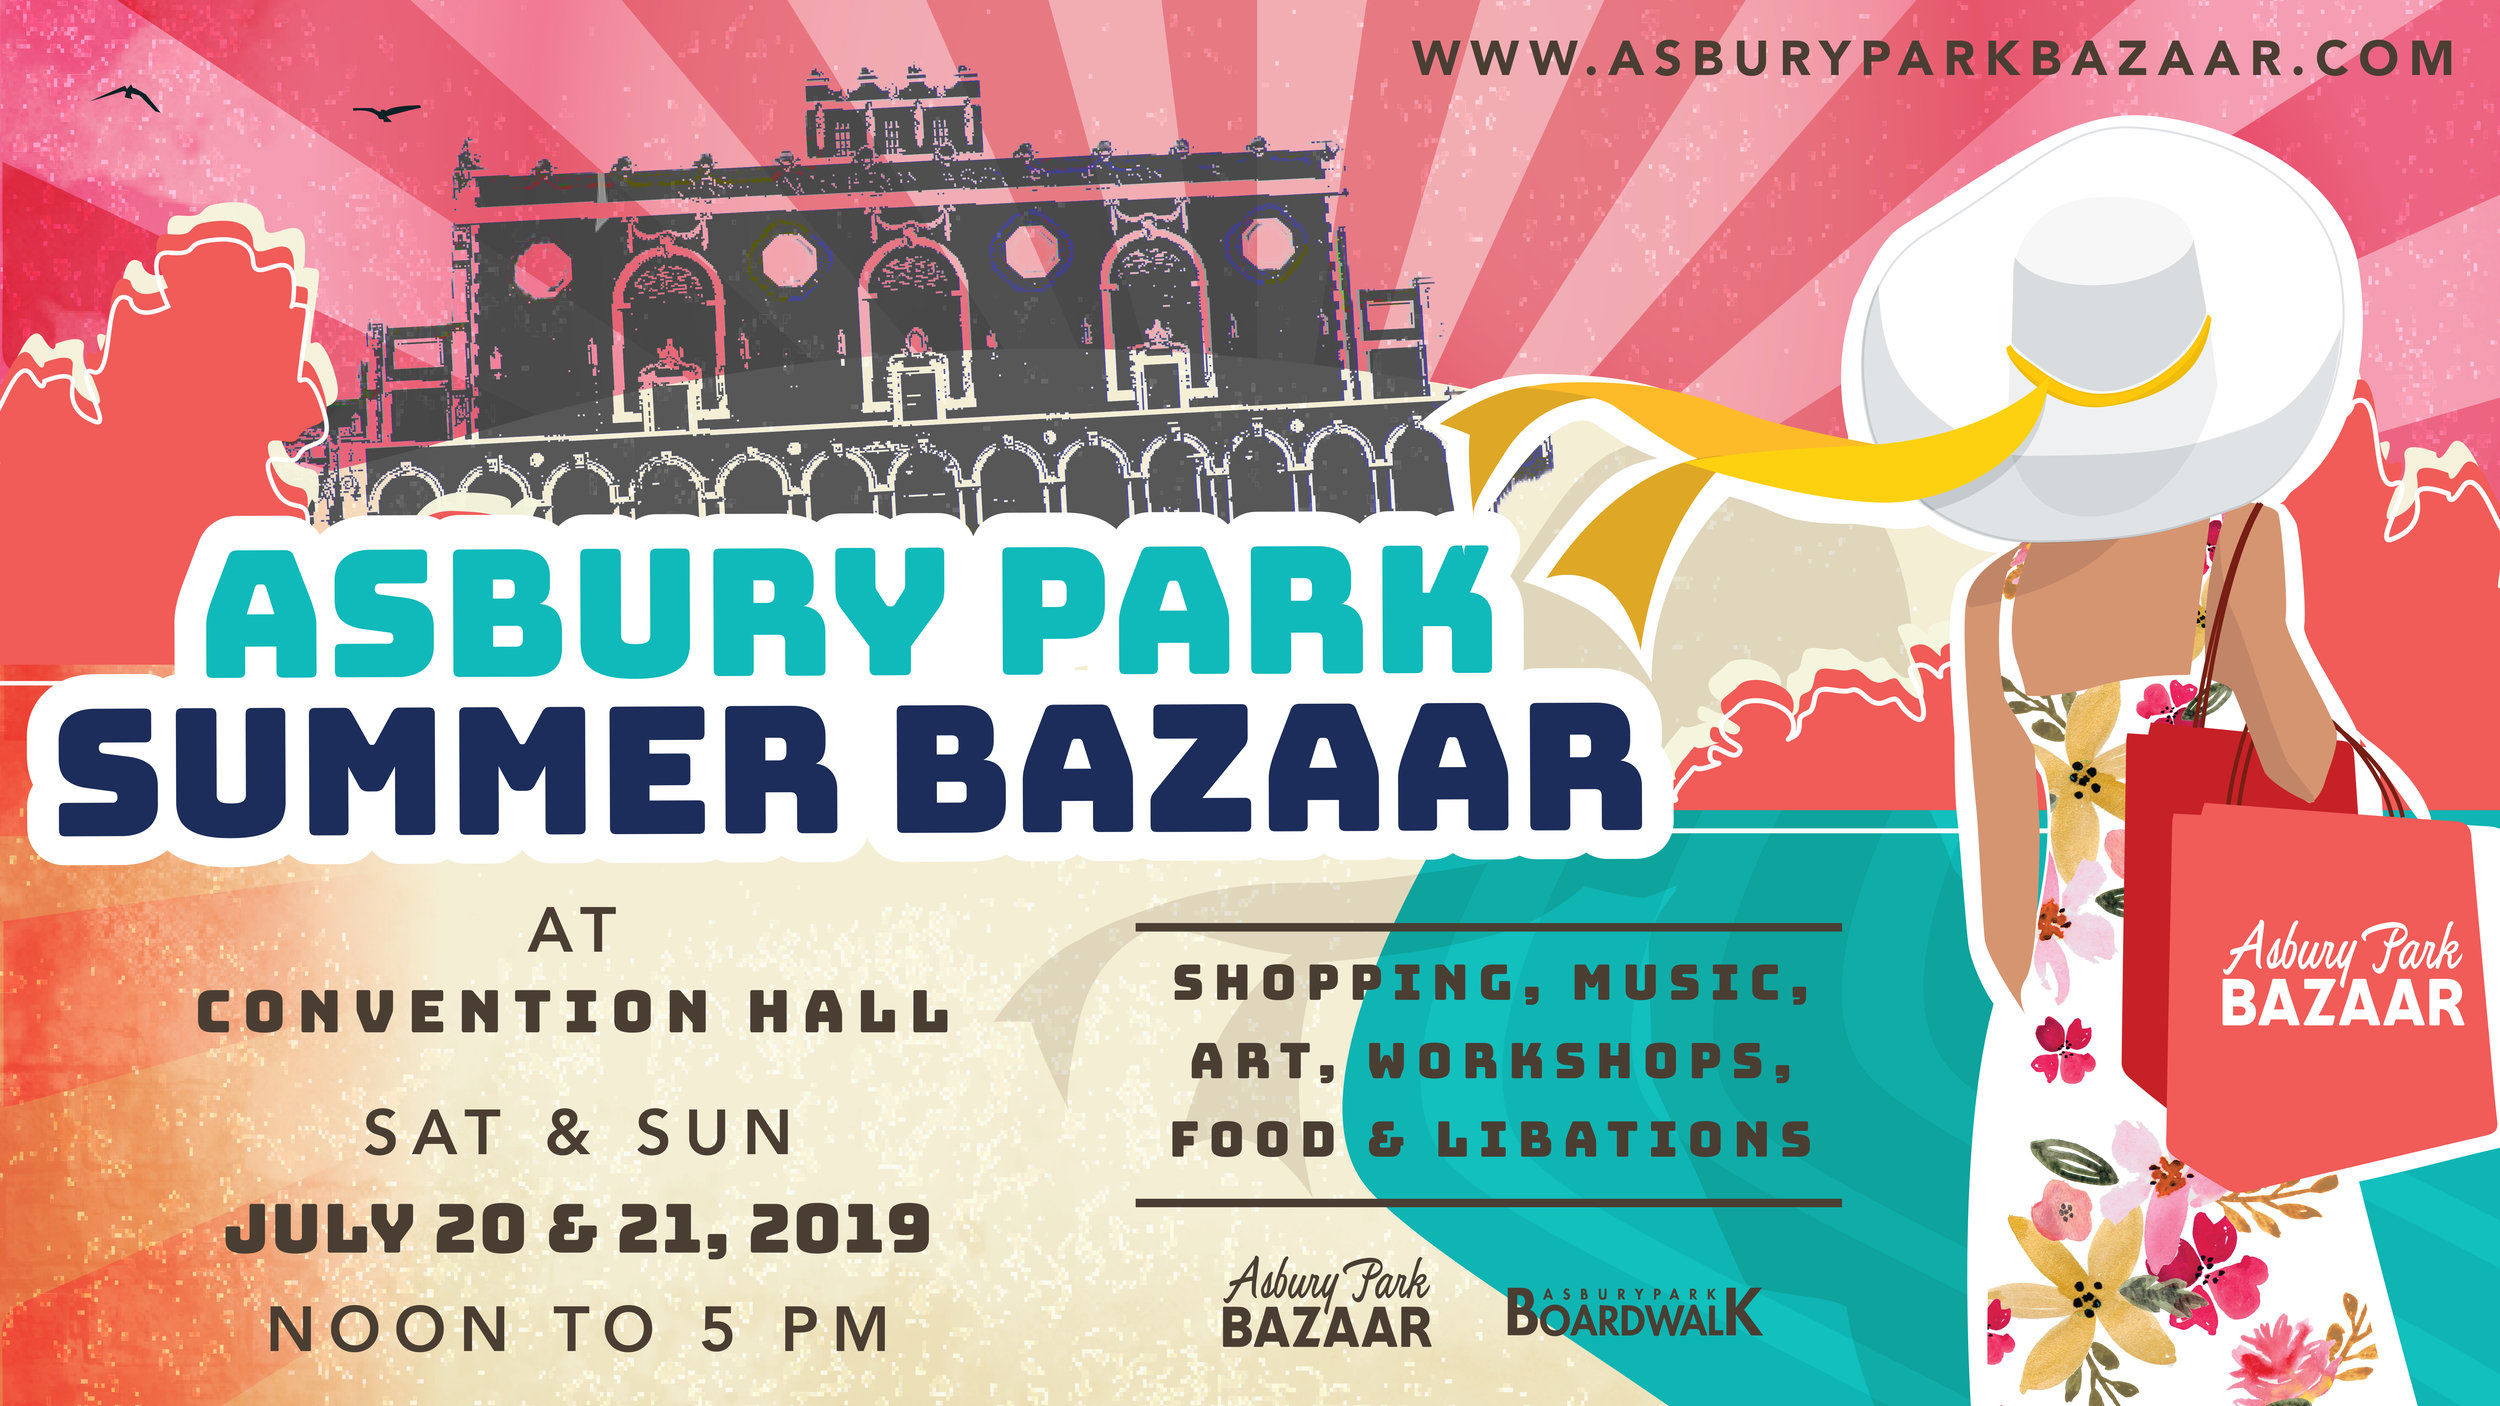 Asbury Park summer Bazaar Facebook.jpg